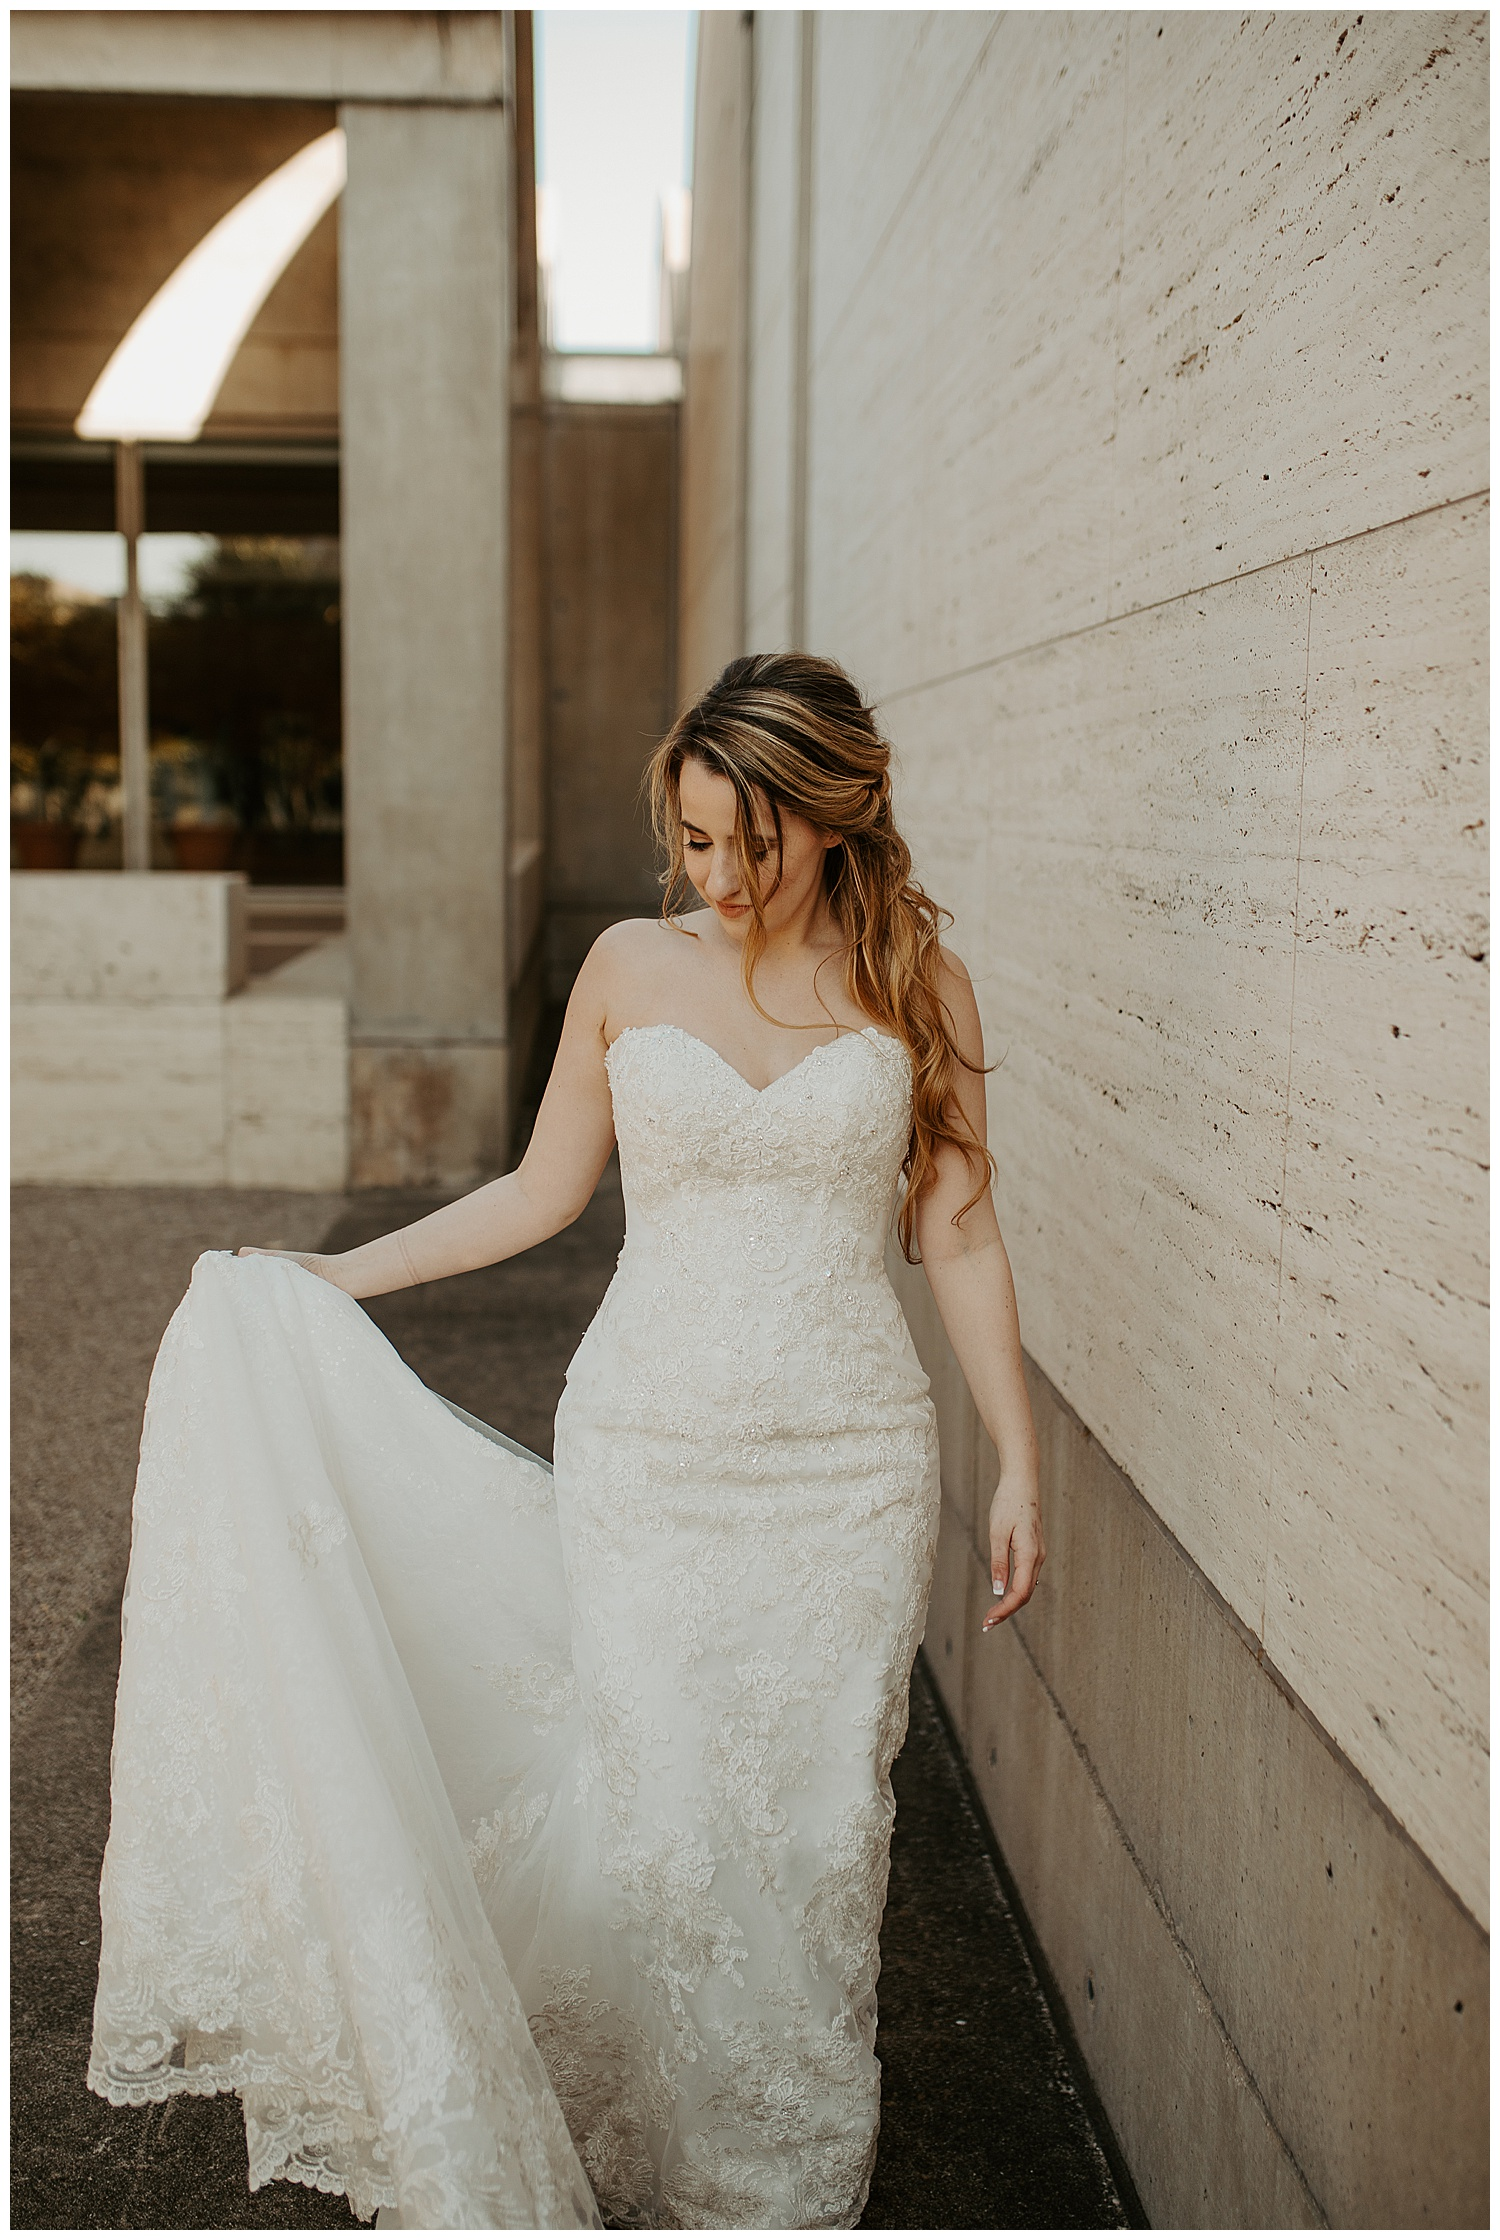 Laken-Mackenzie-Photography-Alyssa-Bridals-Kimbell-Art-Museum-Dallas-Fort-Worth-Wedding-Photographer05.jpg